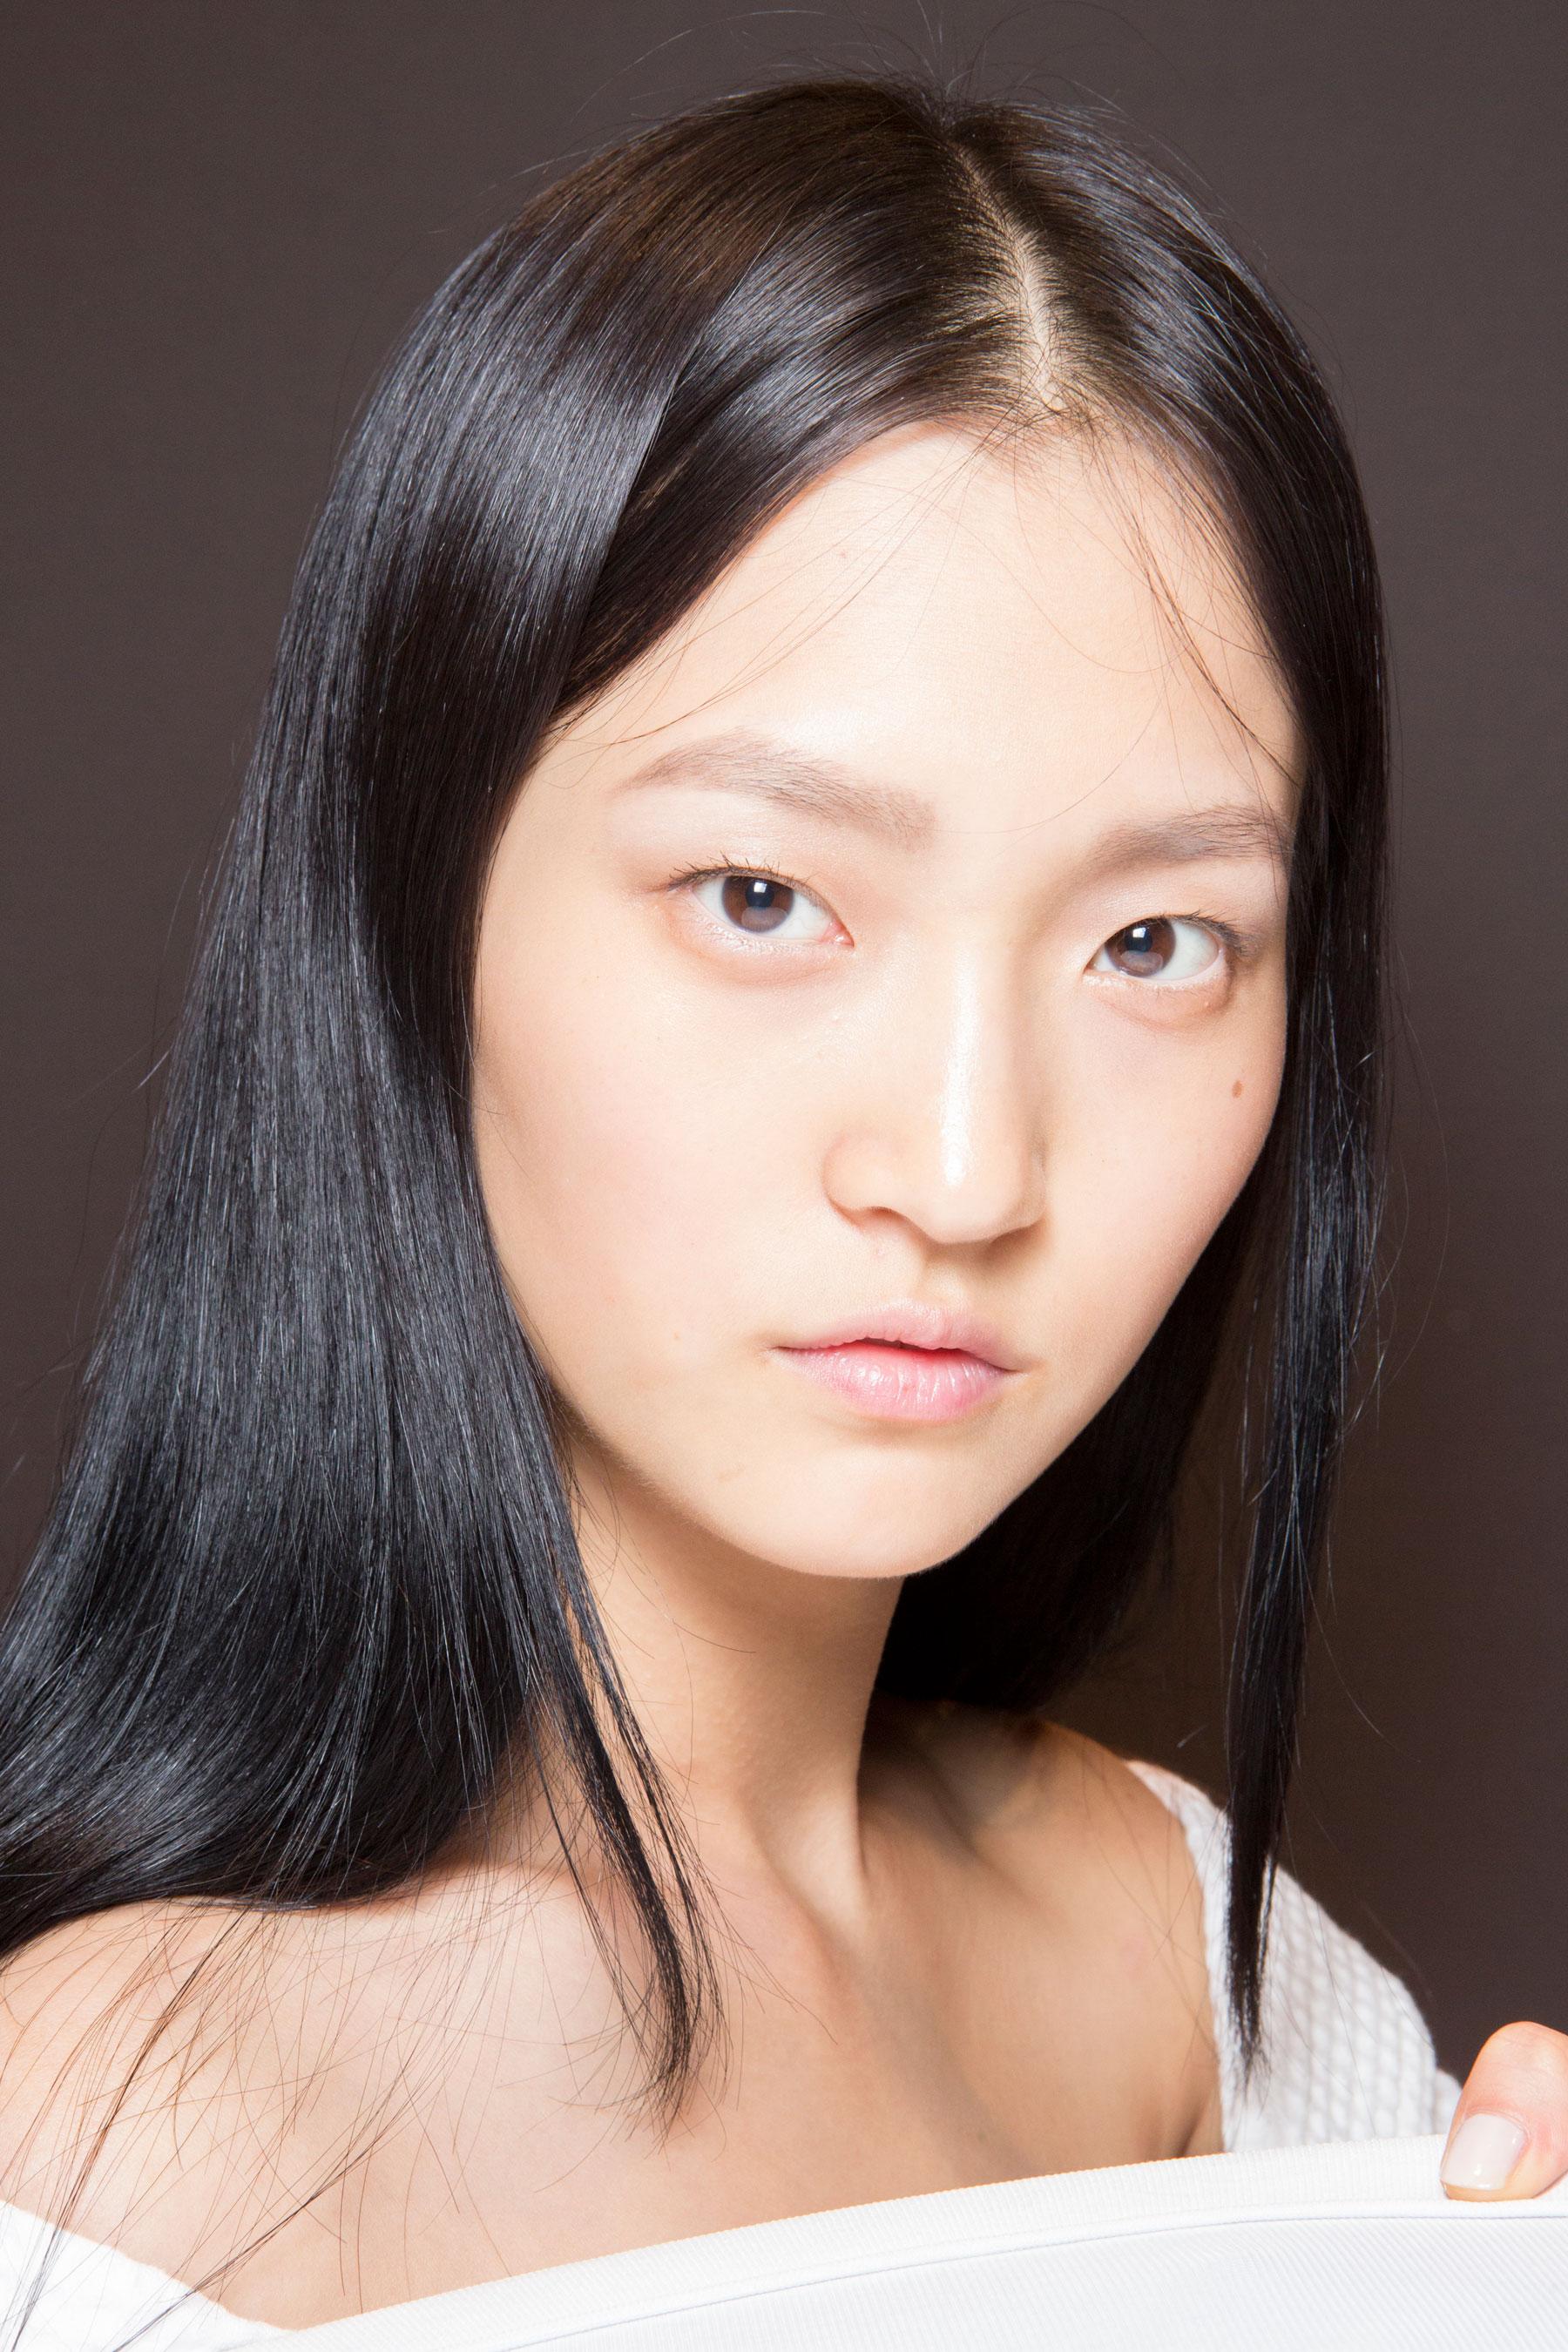 Gucci0-backsatge-beauty-spring-2016-fashion-show-the-impression-062